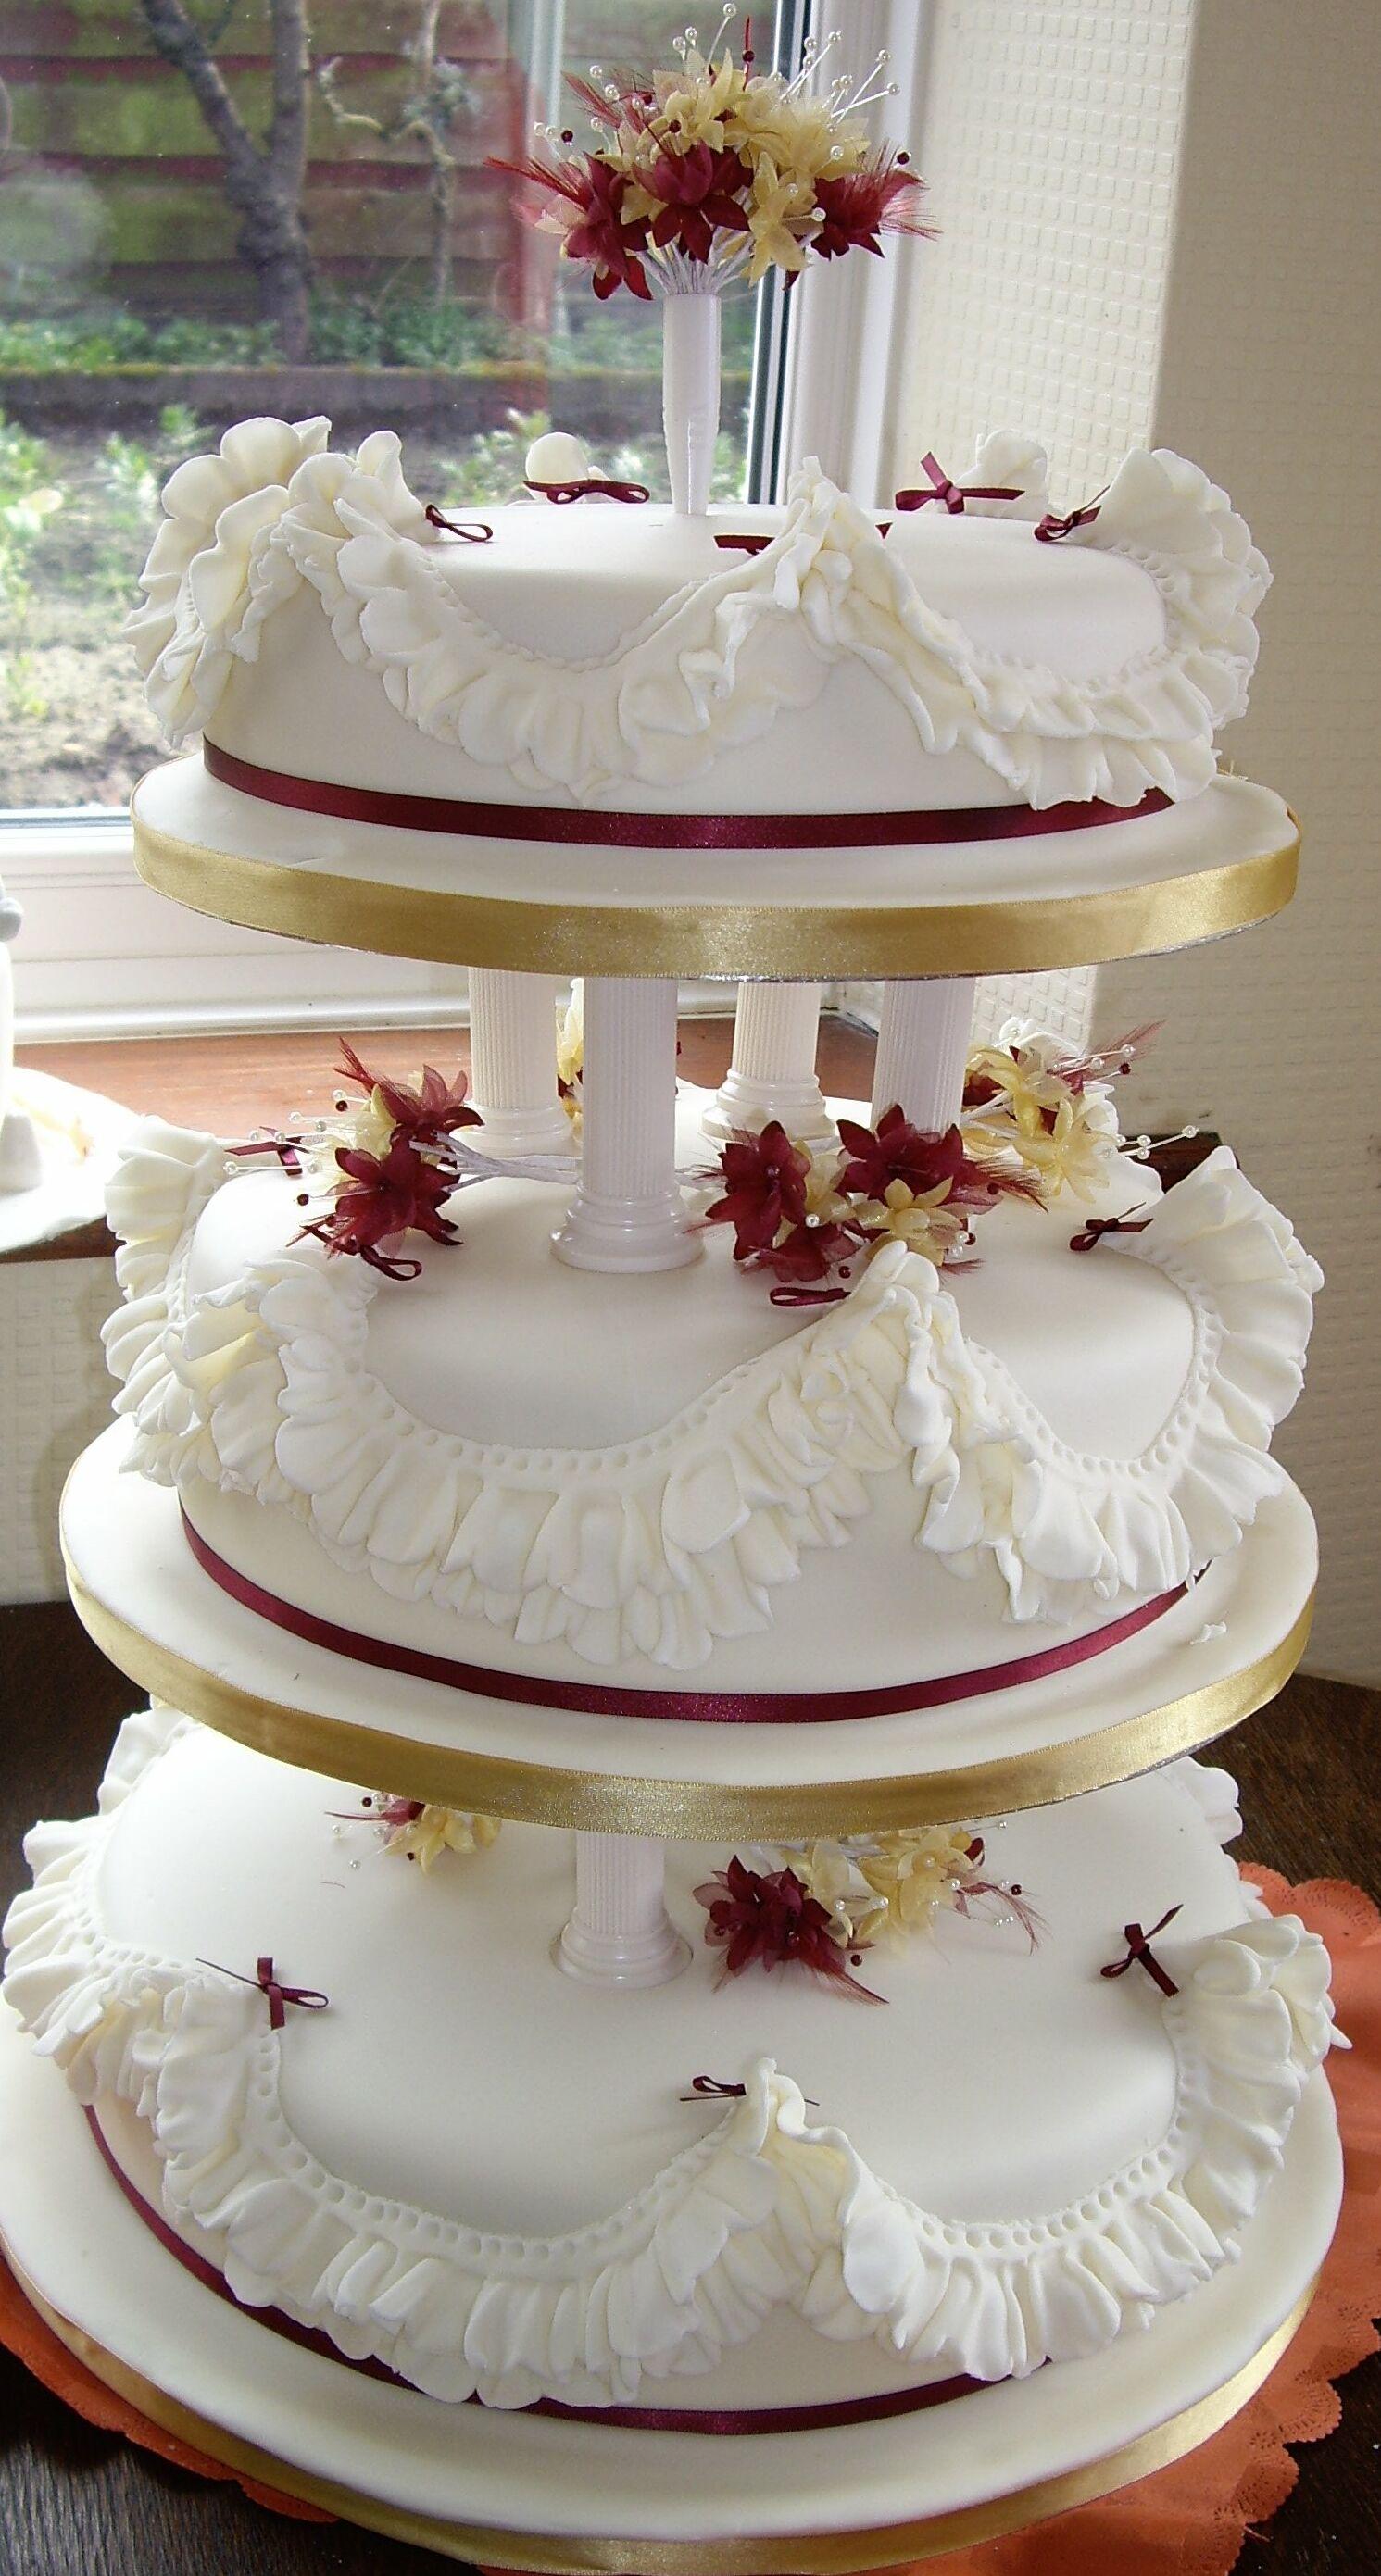 The Most Beautiful Birthday Cake